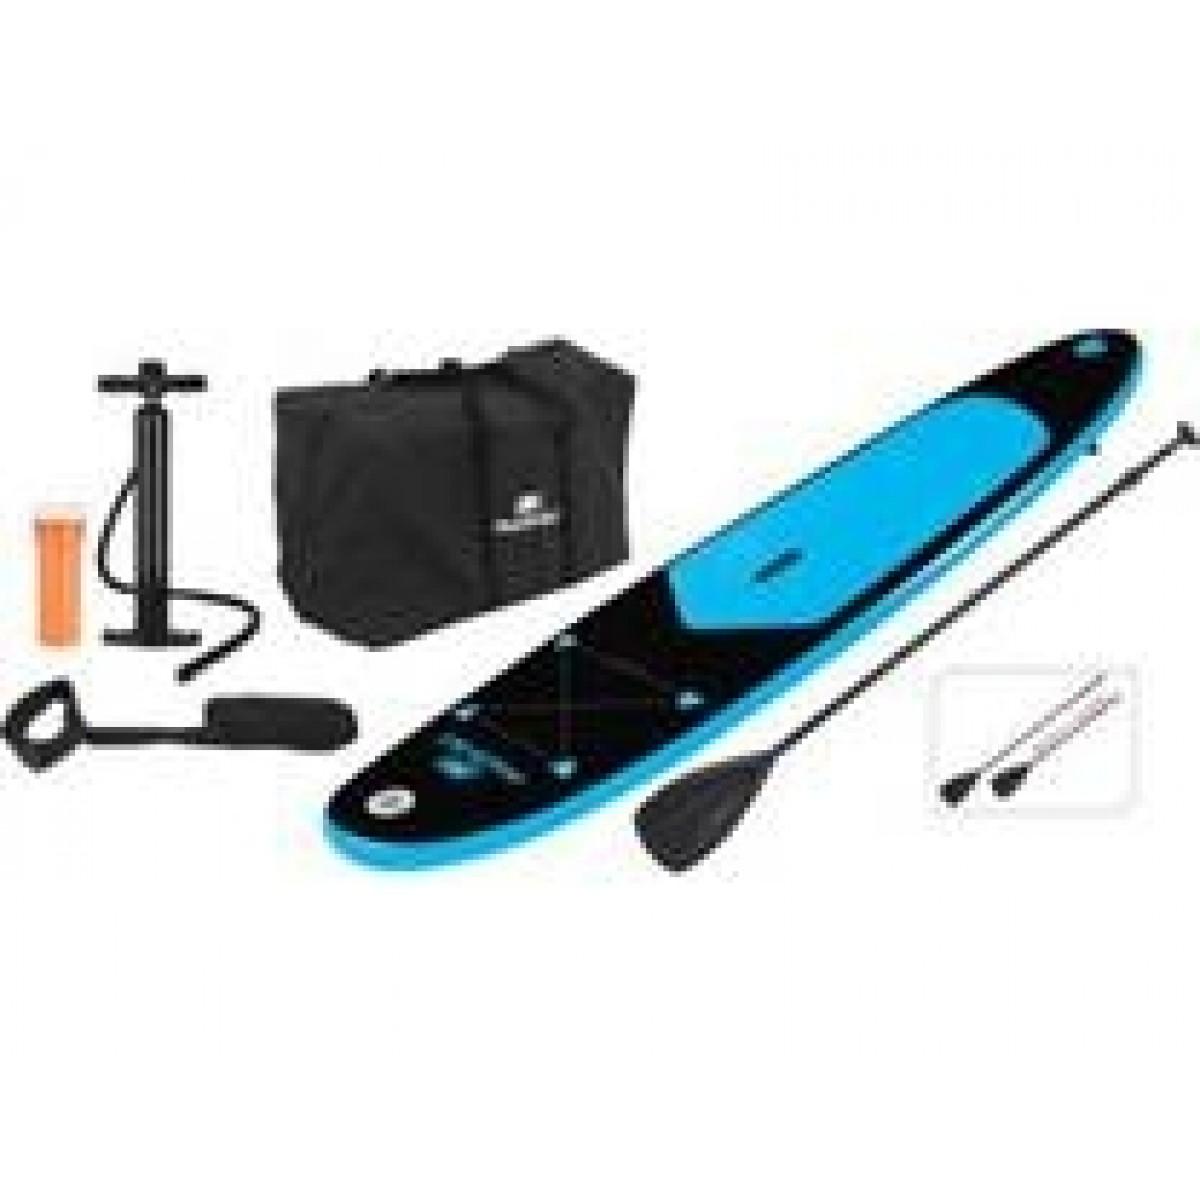 WAIKIKI Sub stand up paddle board sæt